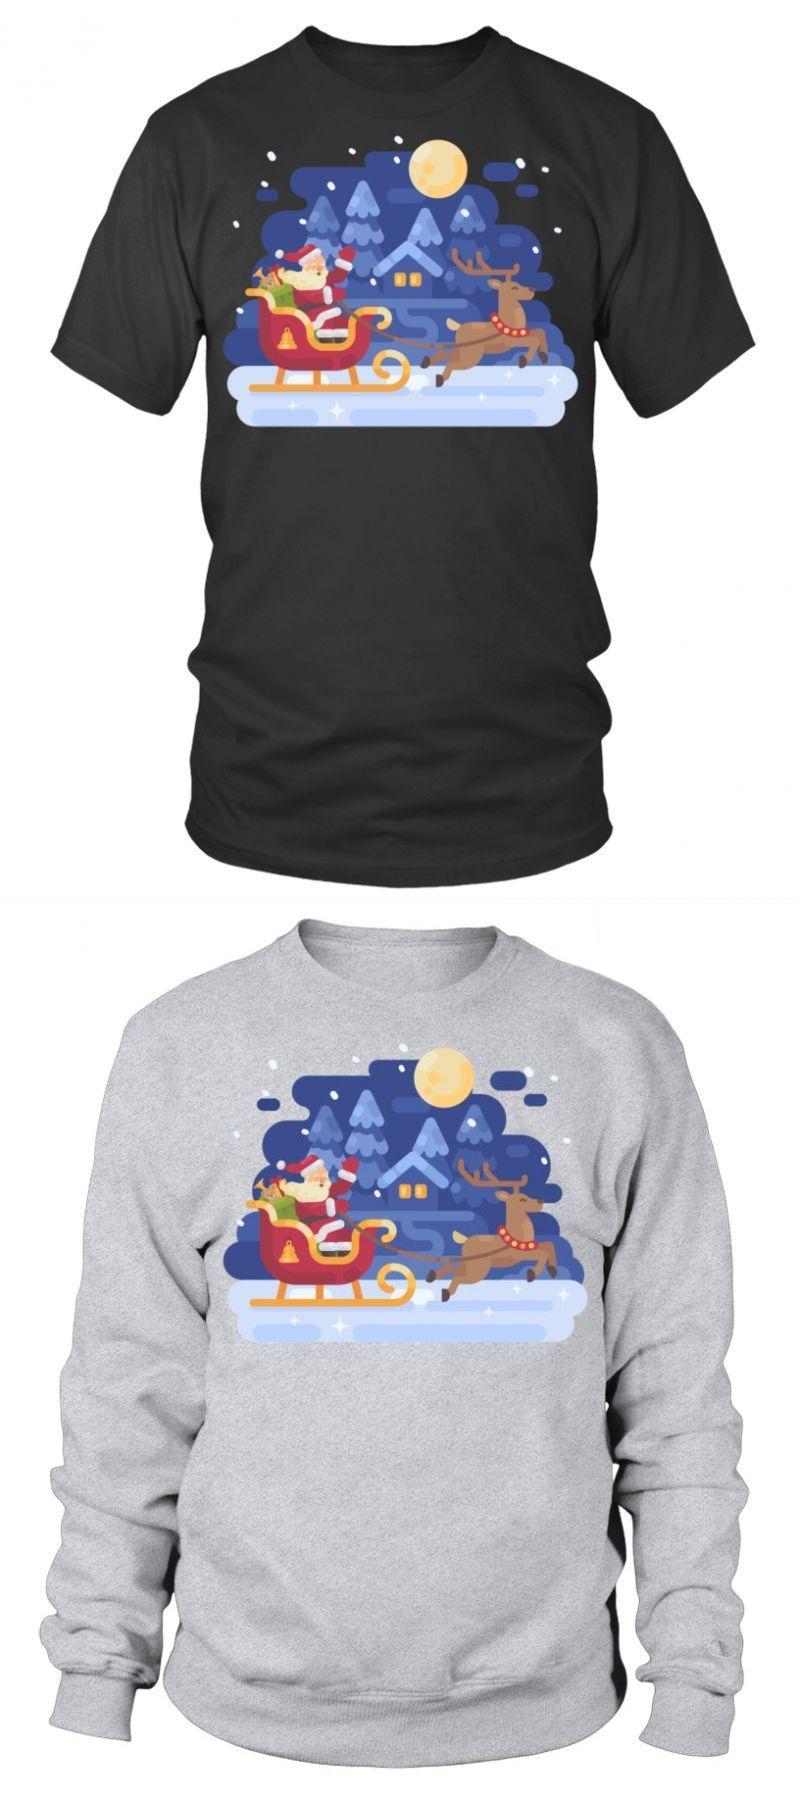 Easter T Shirt Designs 4502 Christmas Easter T Shirt Craft Ideas